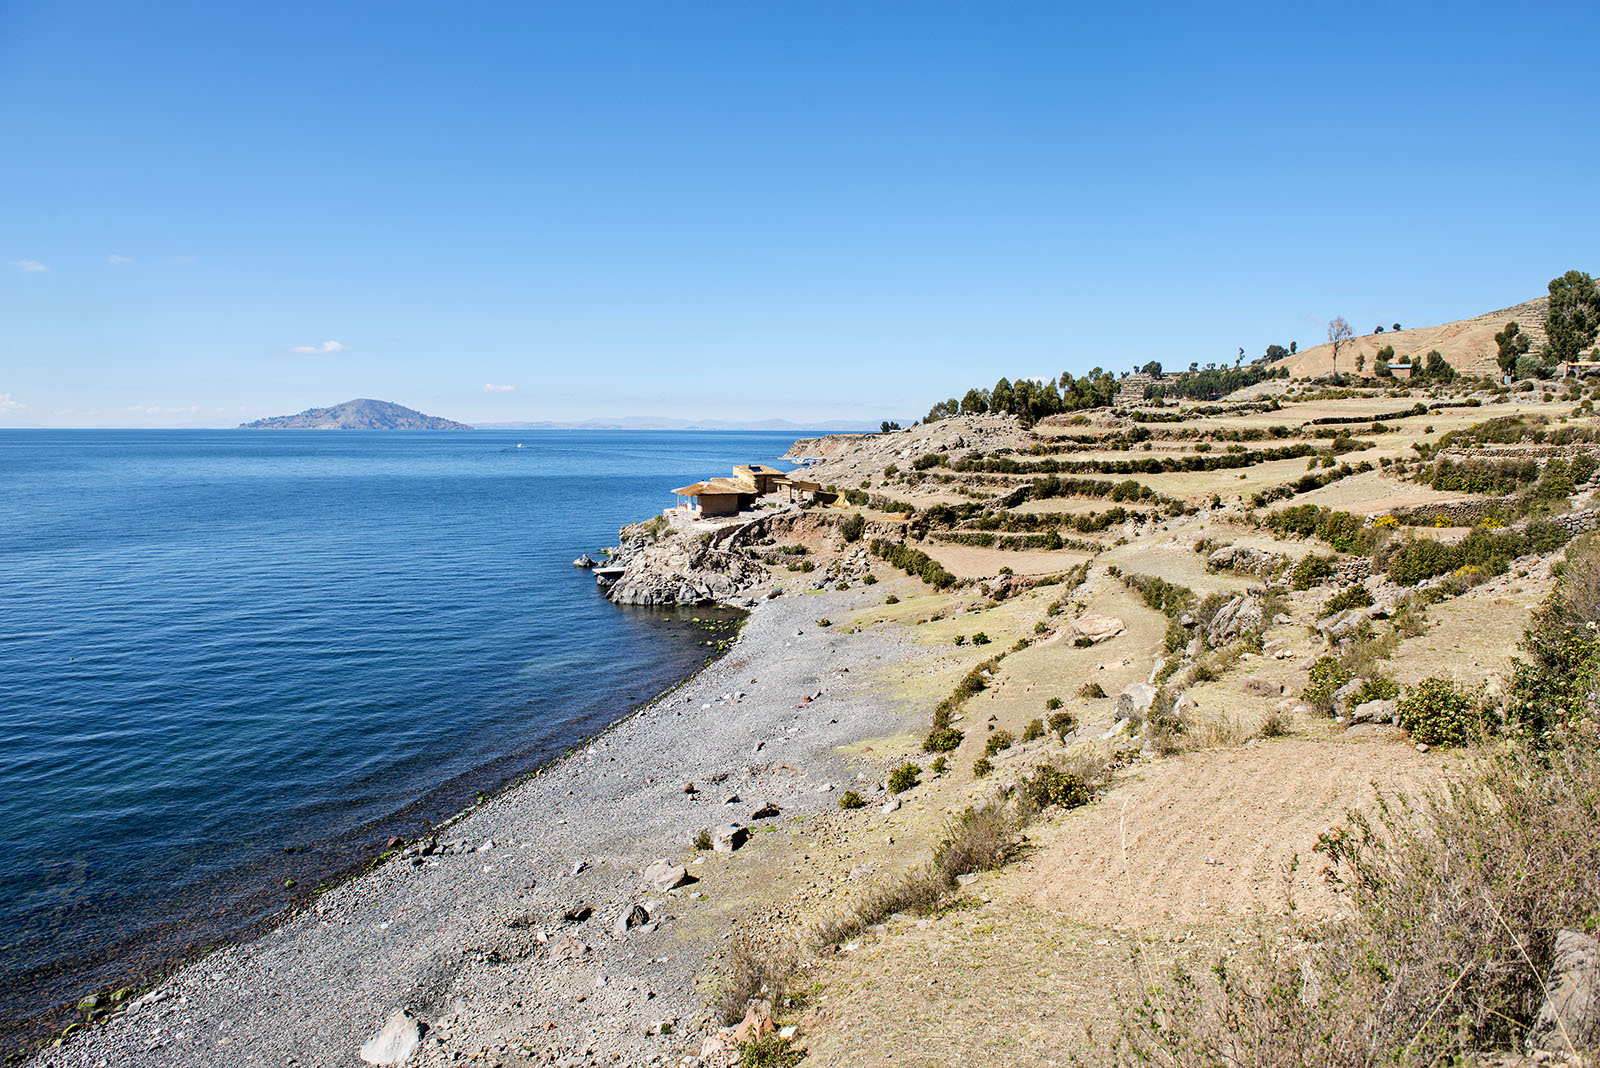 amantani-island-lake-titicaca